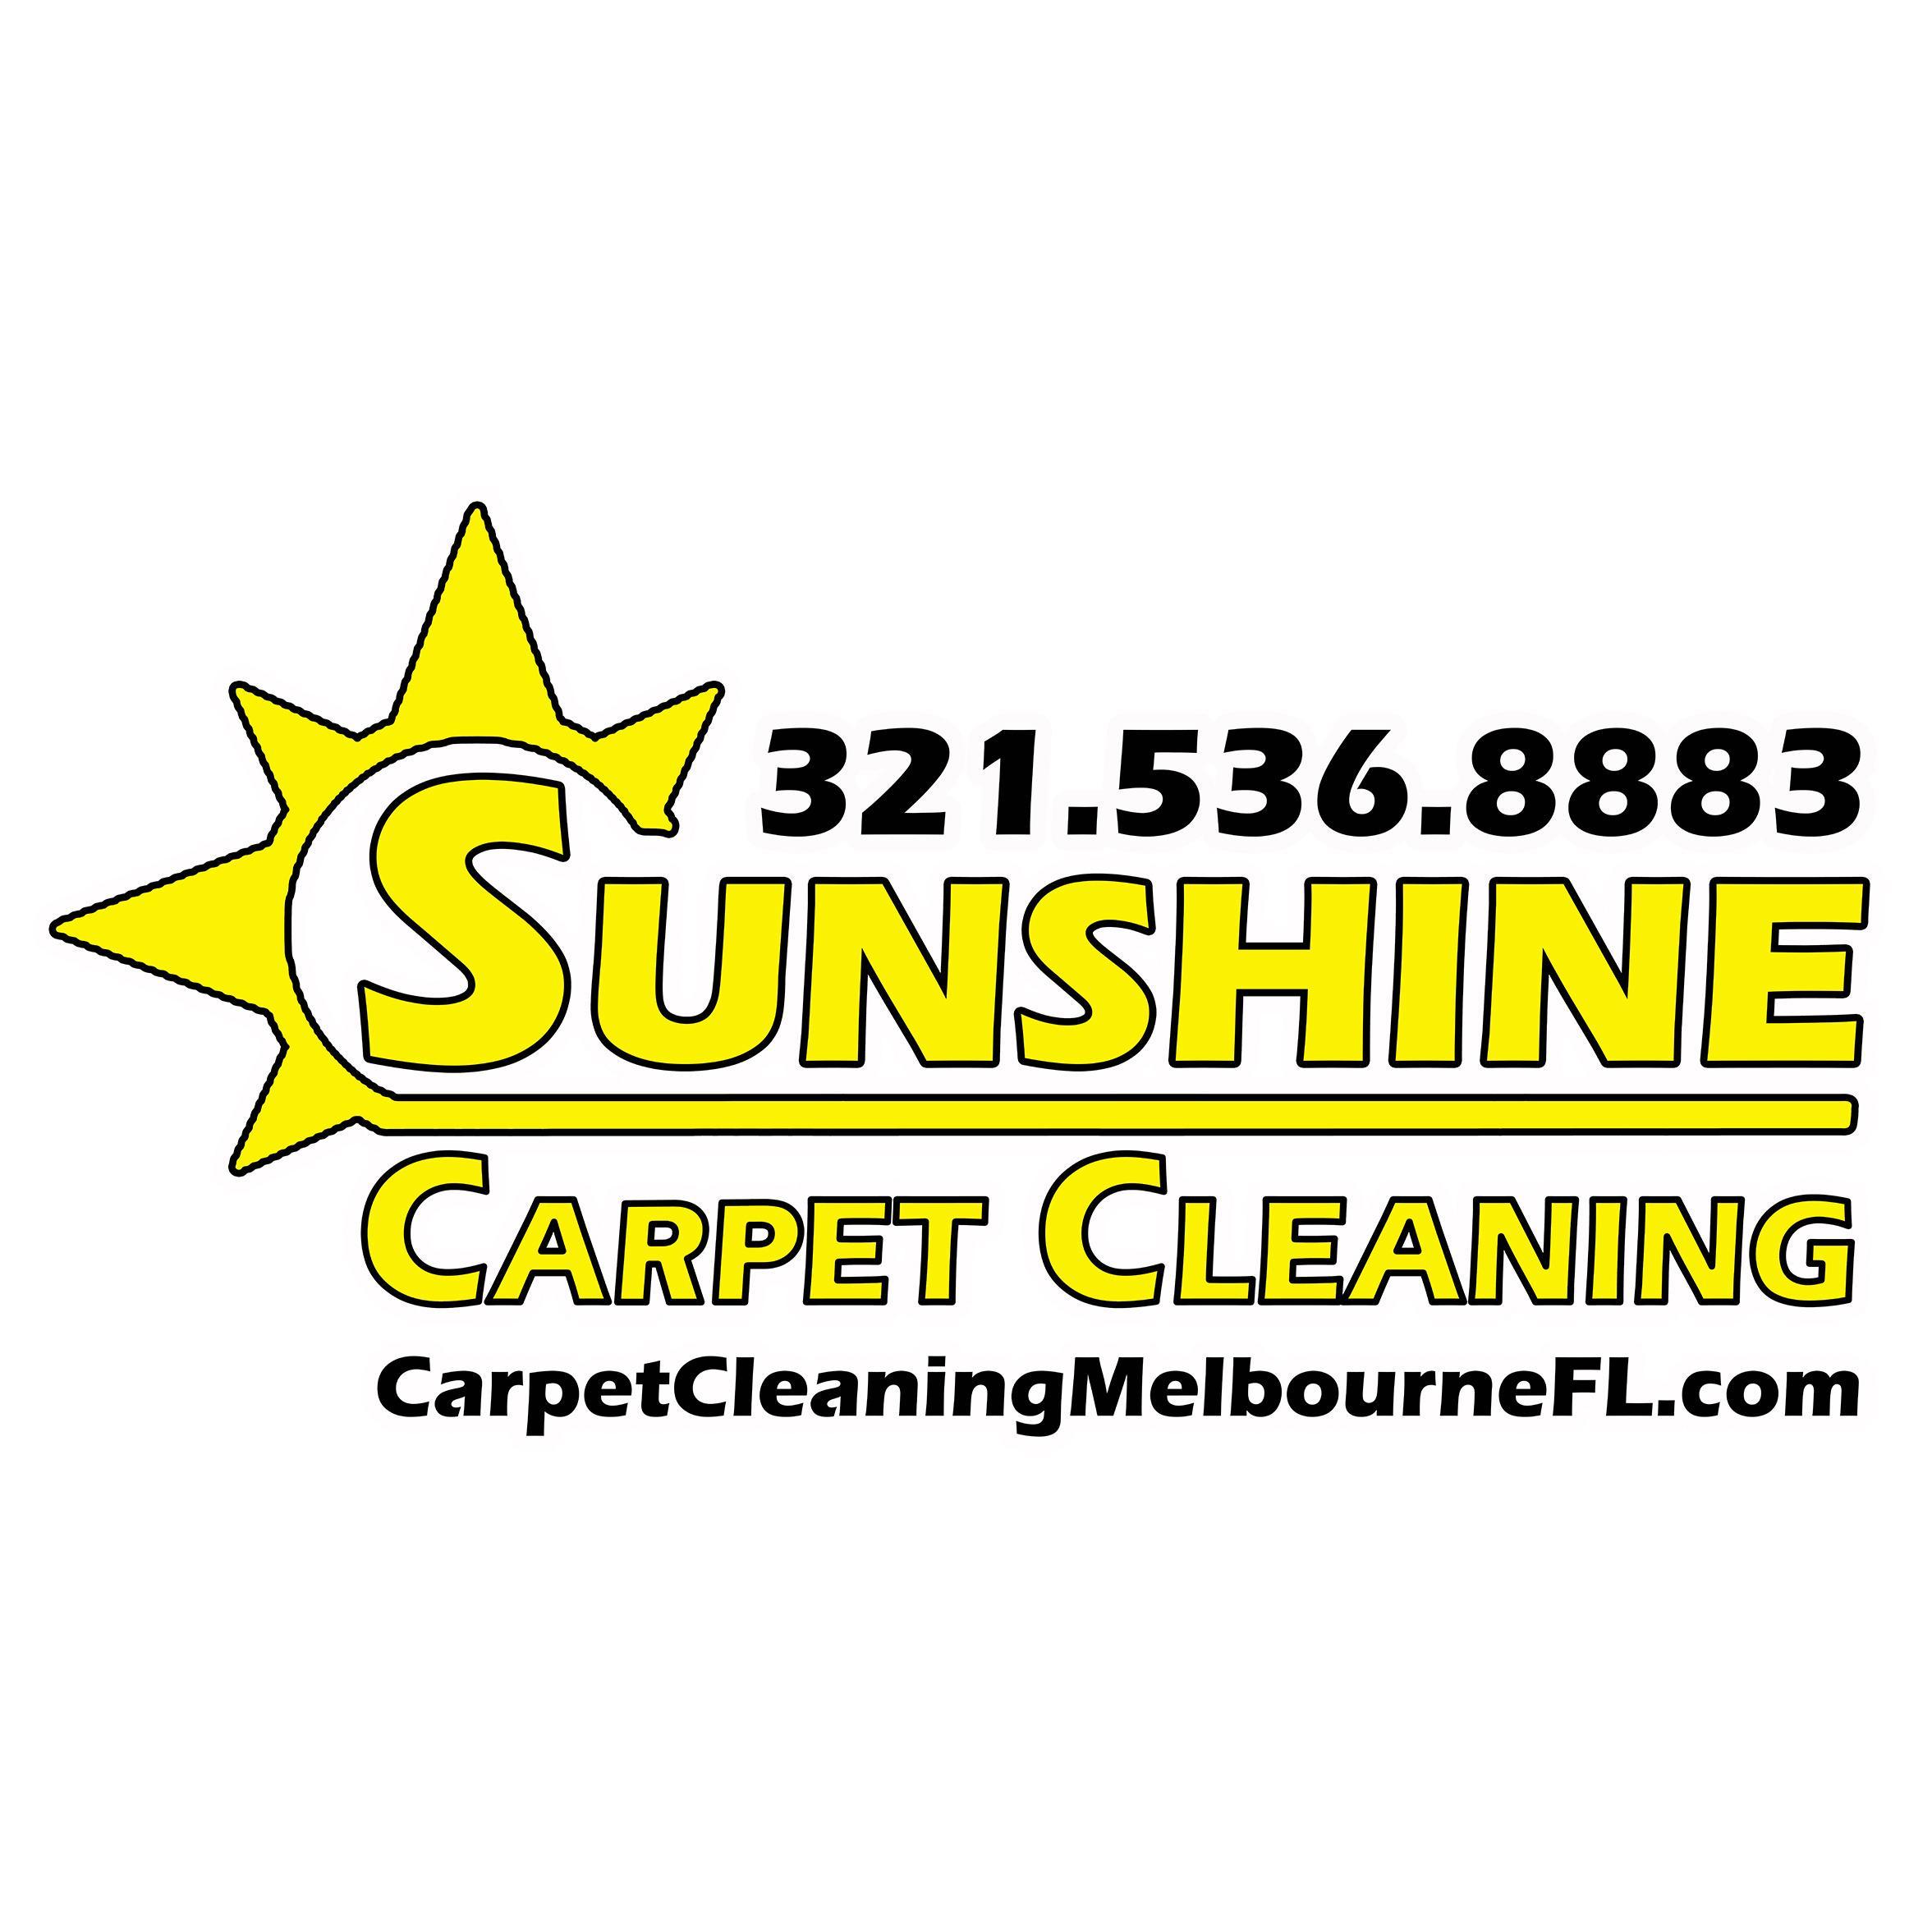 Carpet Cleaning 2600 Aurora Rd Ste K